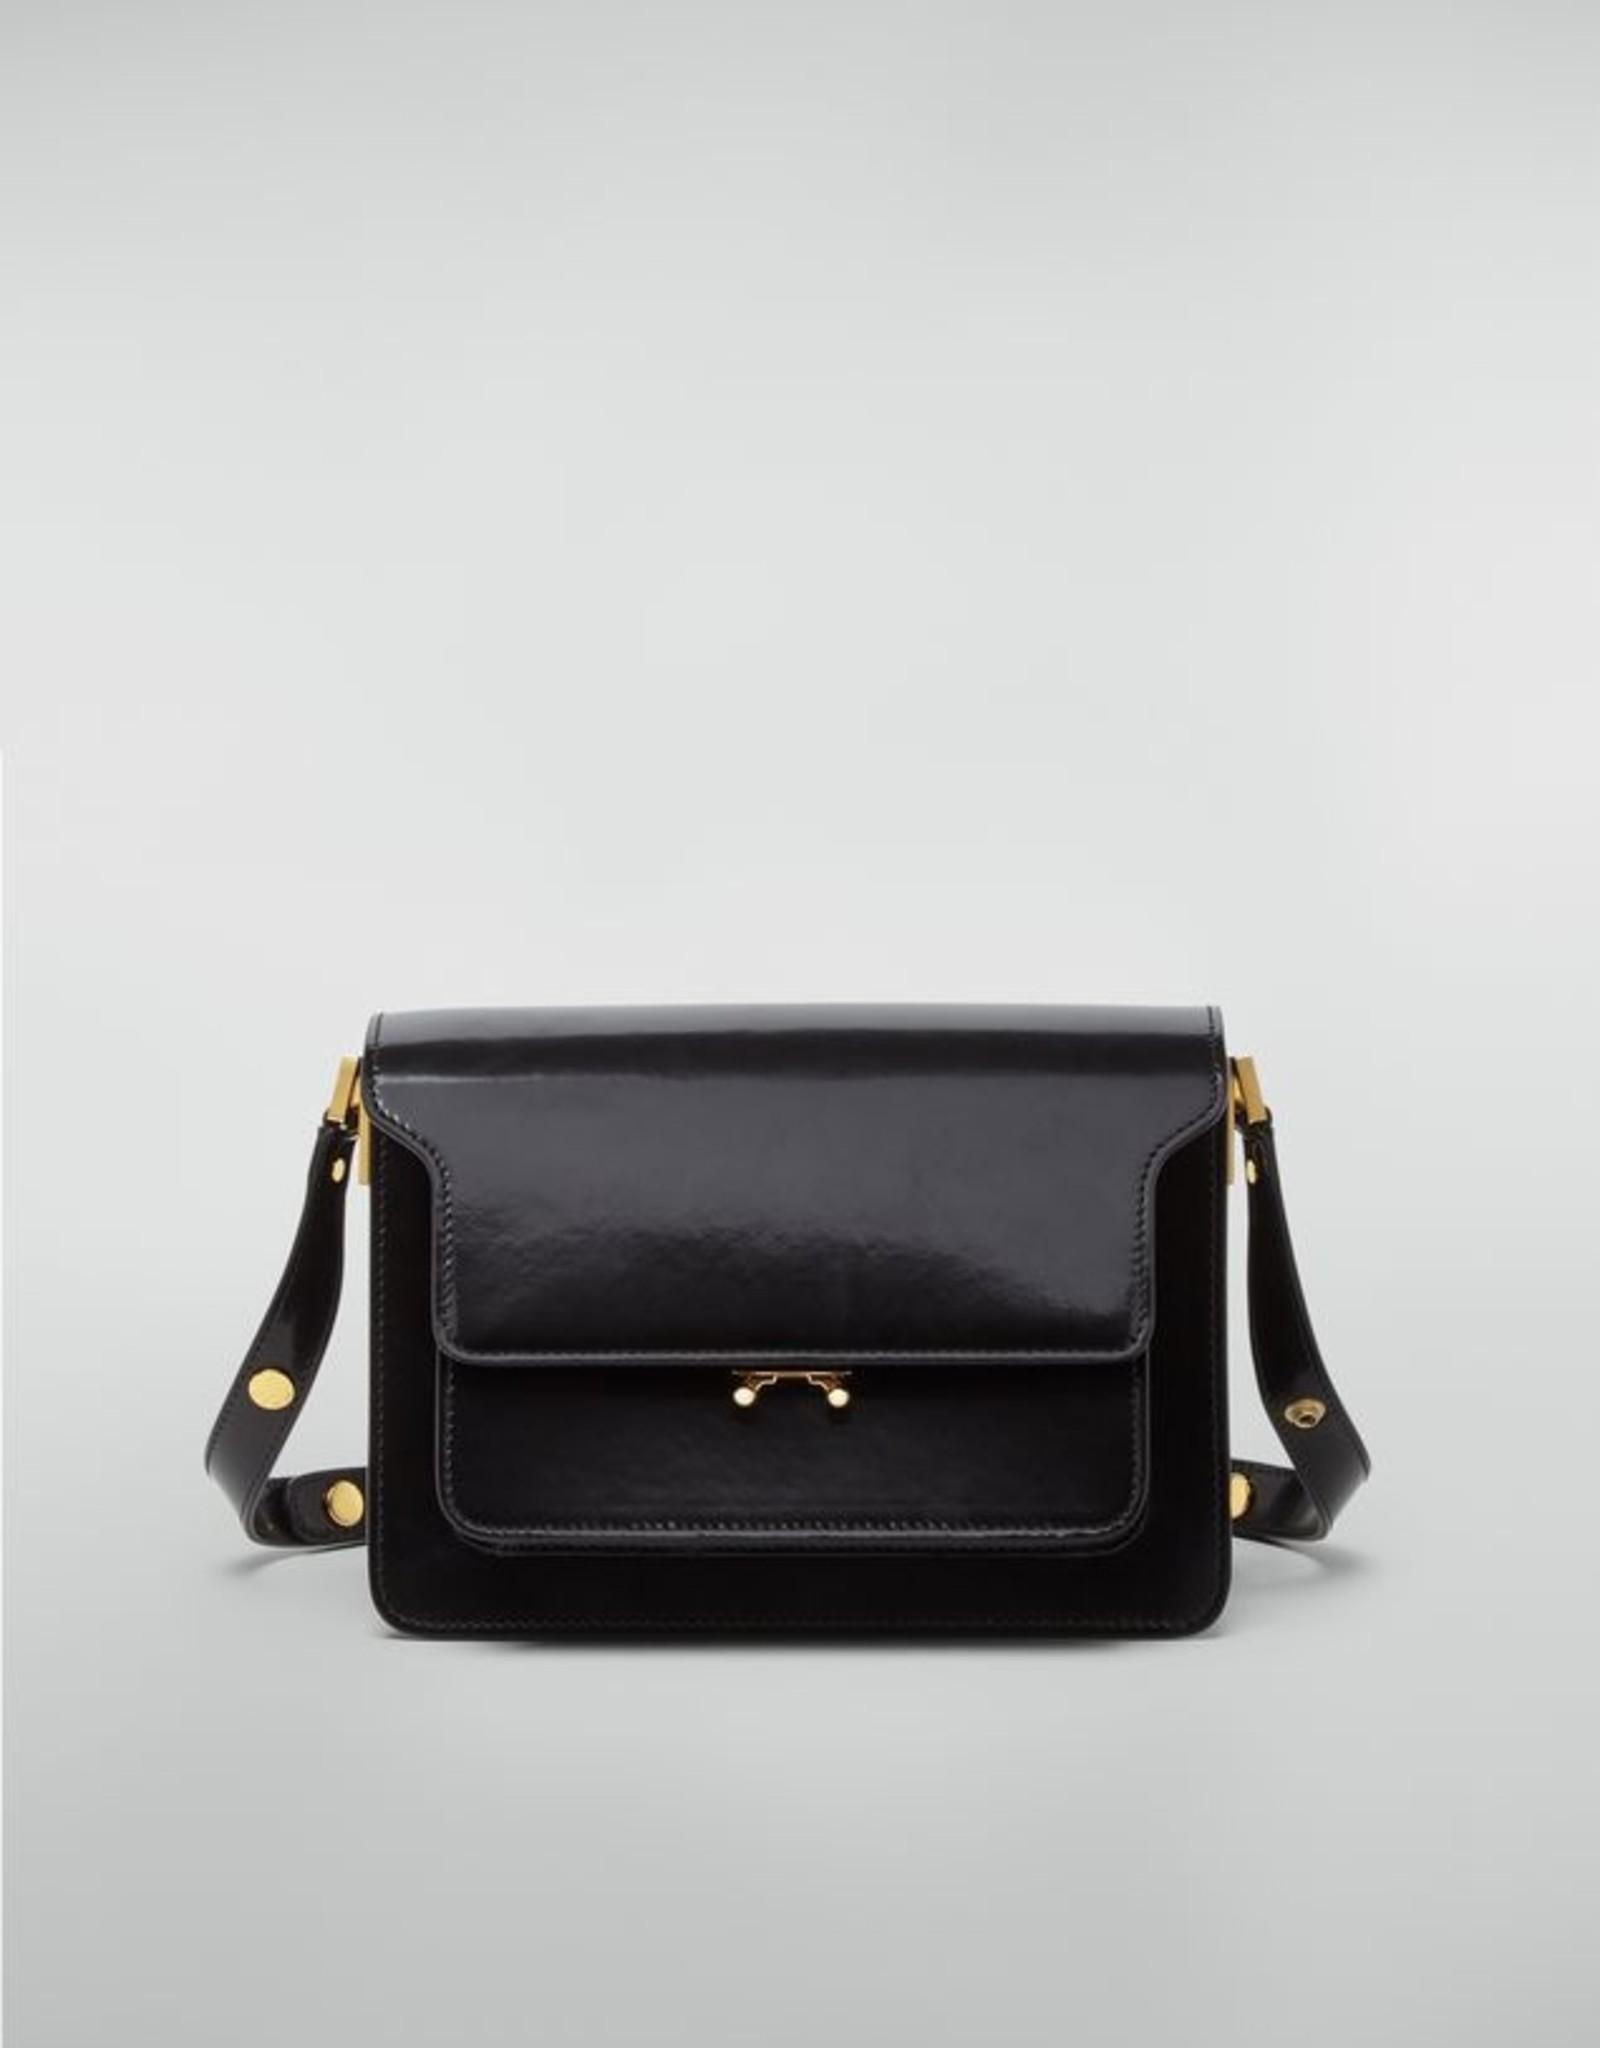 Marni Marni Trunk Bag Black